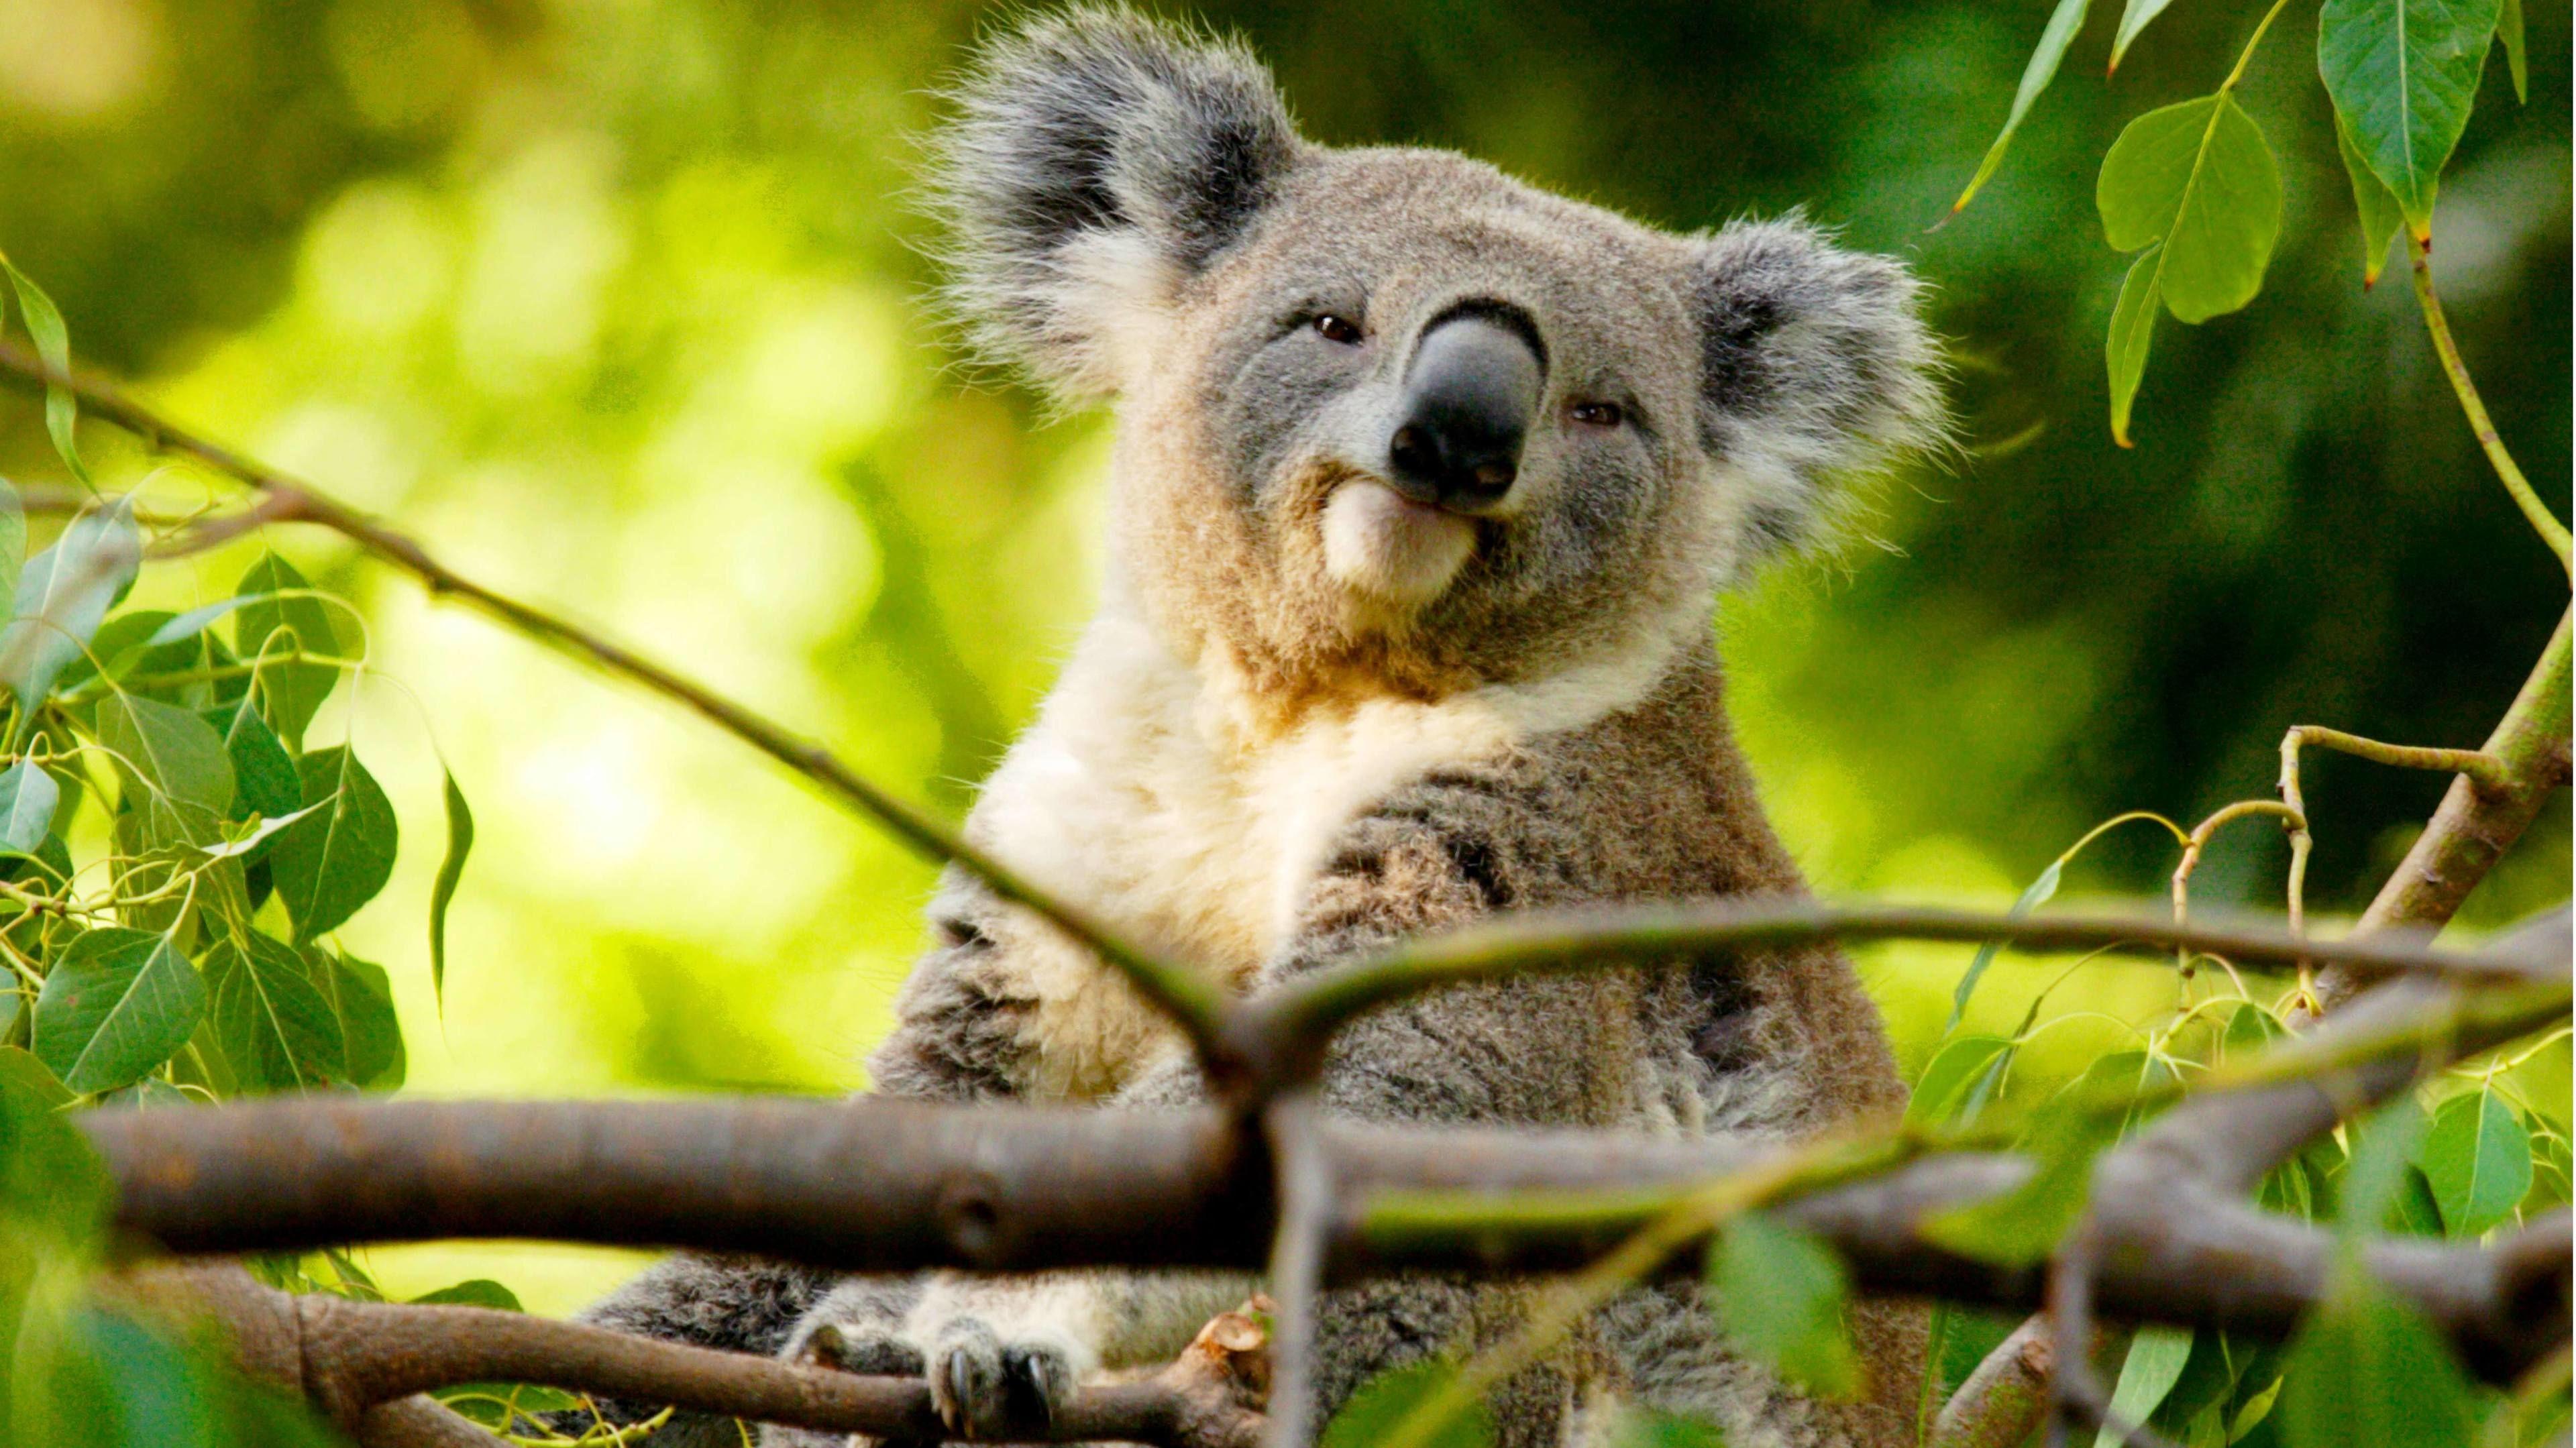 A koala bear in a tree on Kangaroo Island